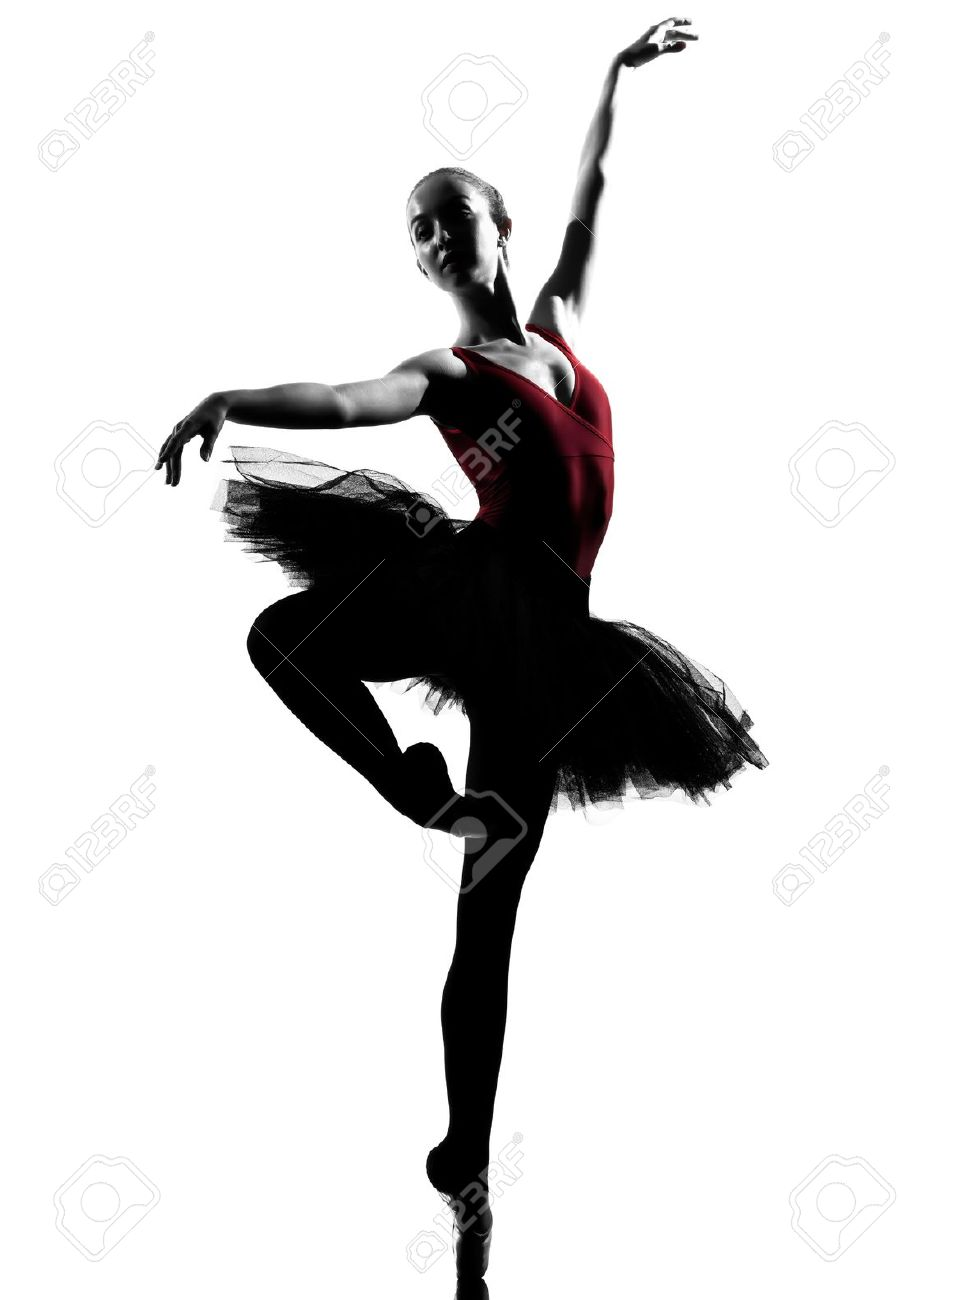 973x1300 One Caucasian Young Woman Ballerina Ballet Dancer Dancing